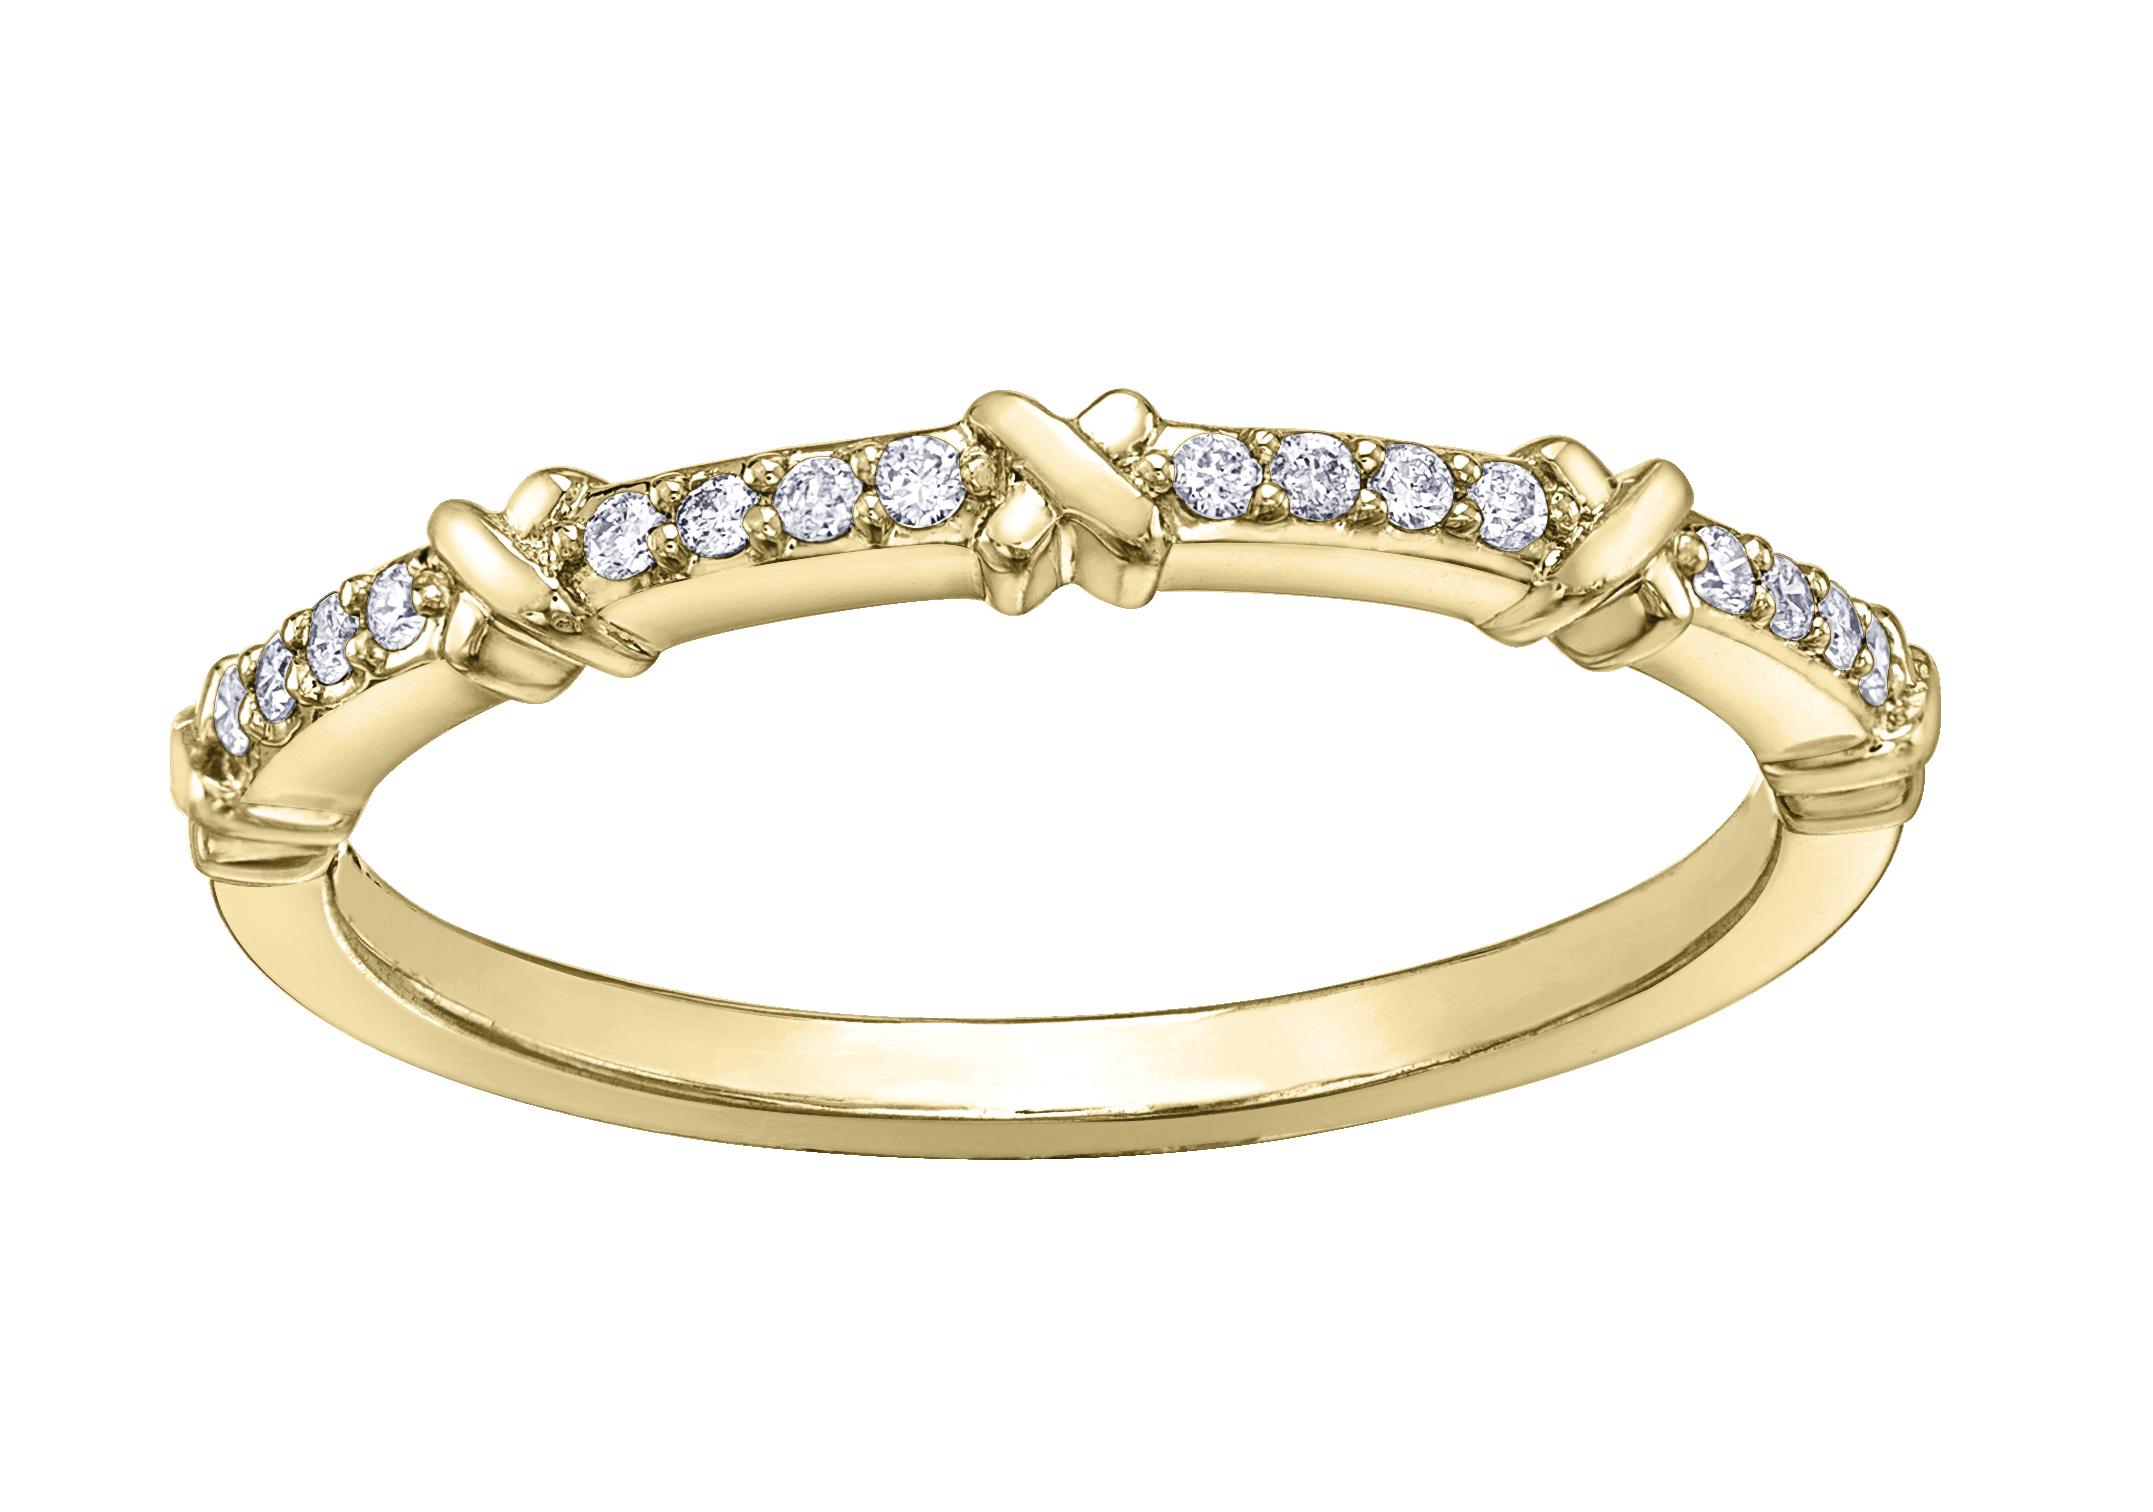 Jonc d'anniversaire - Or jaune10K & Diamants totalisant 0.08 carat